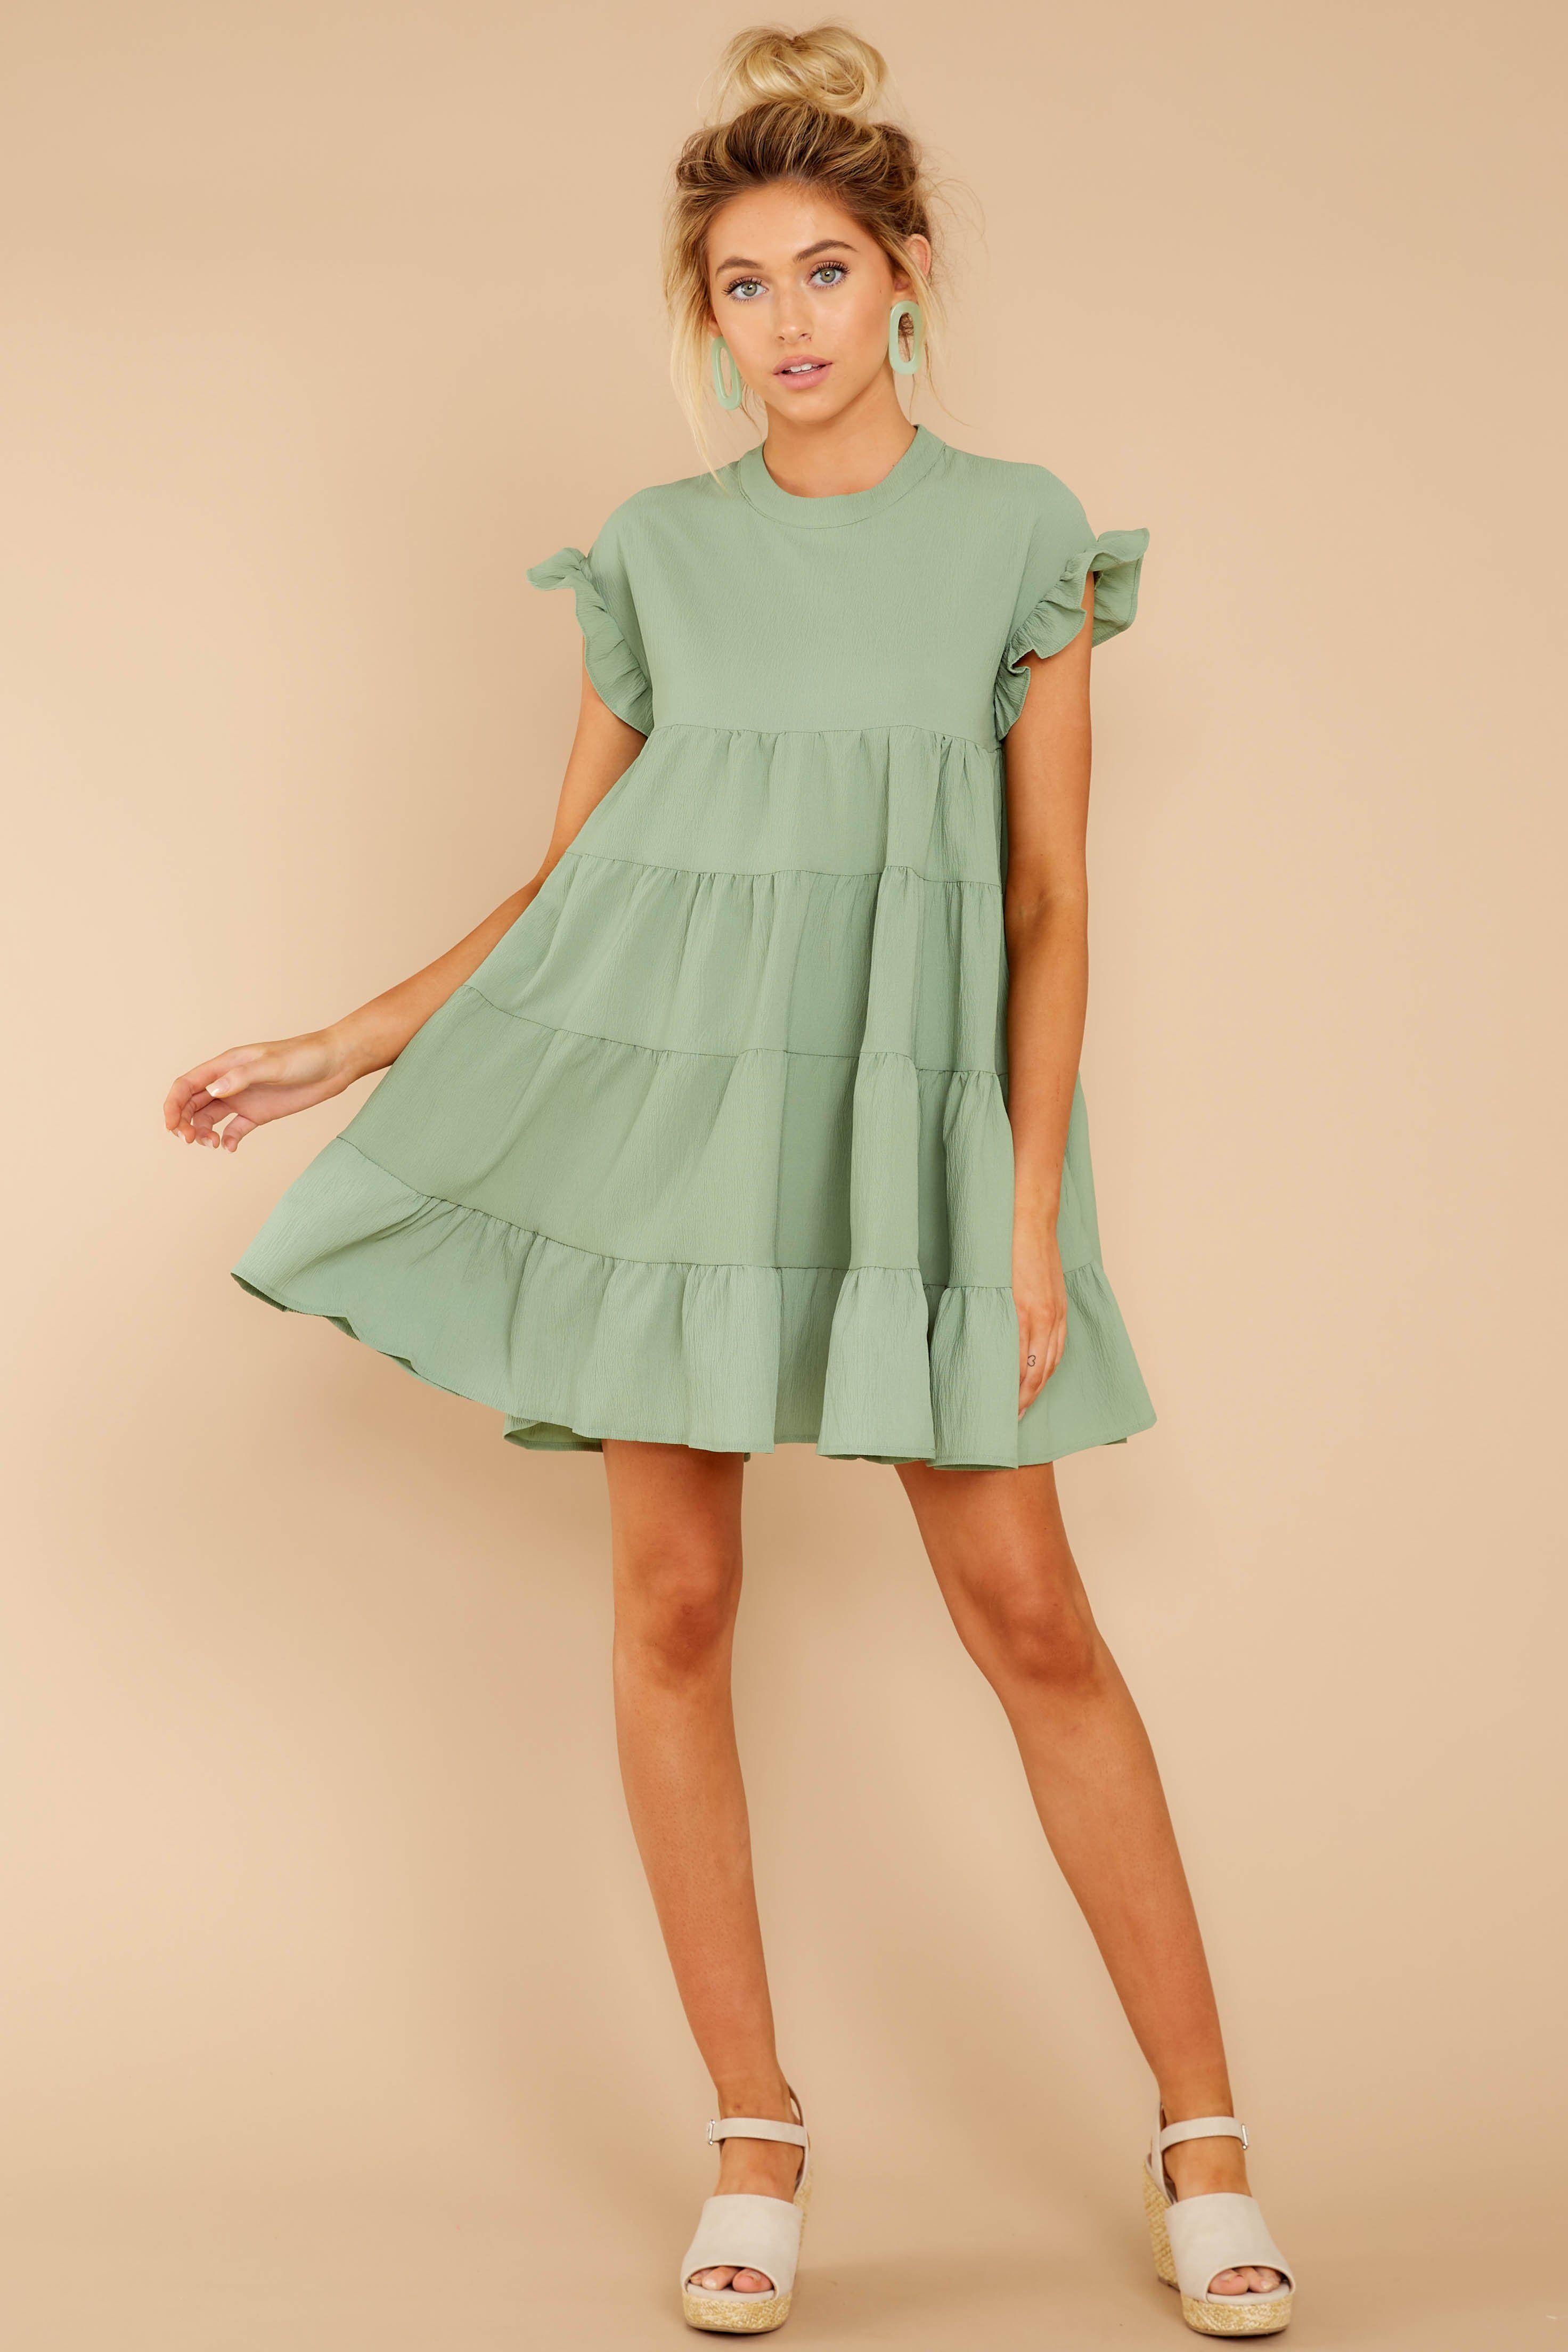 Adorable Green Shift Dress Short Sleeve Babydoll Dress Dress 44 Red Dress Dresses Flowy Dress Short Shift Dress [ 4416 x 2944 Pixel ]